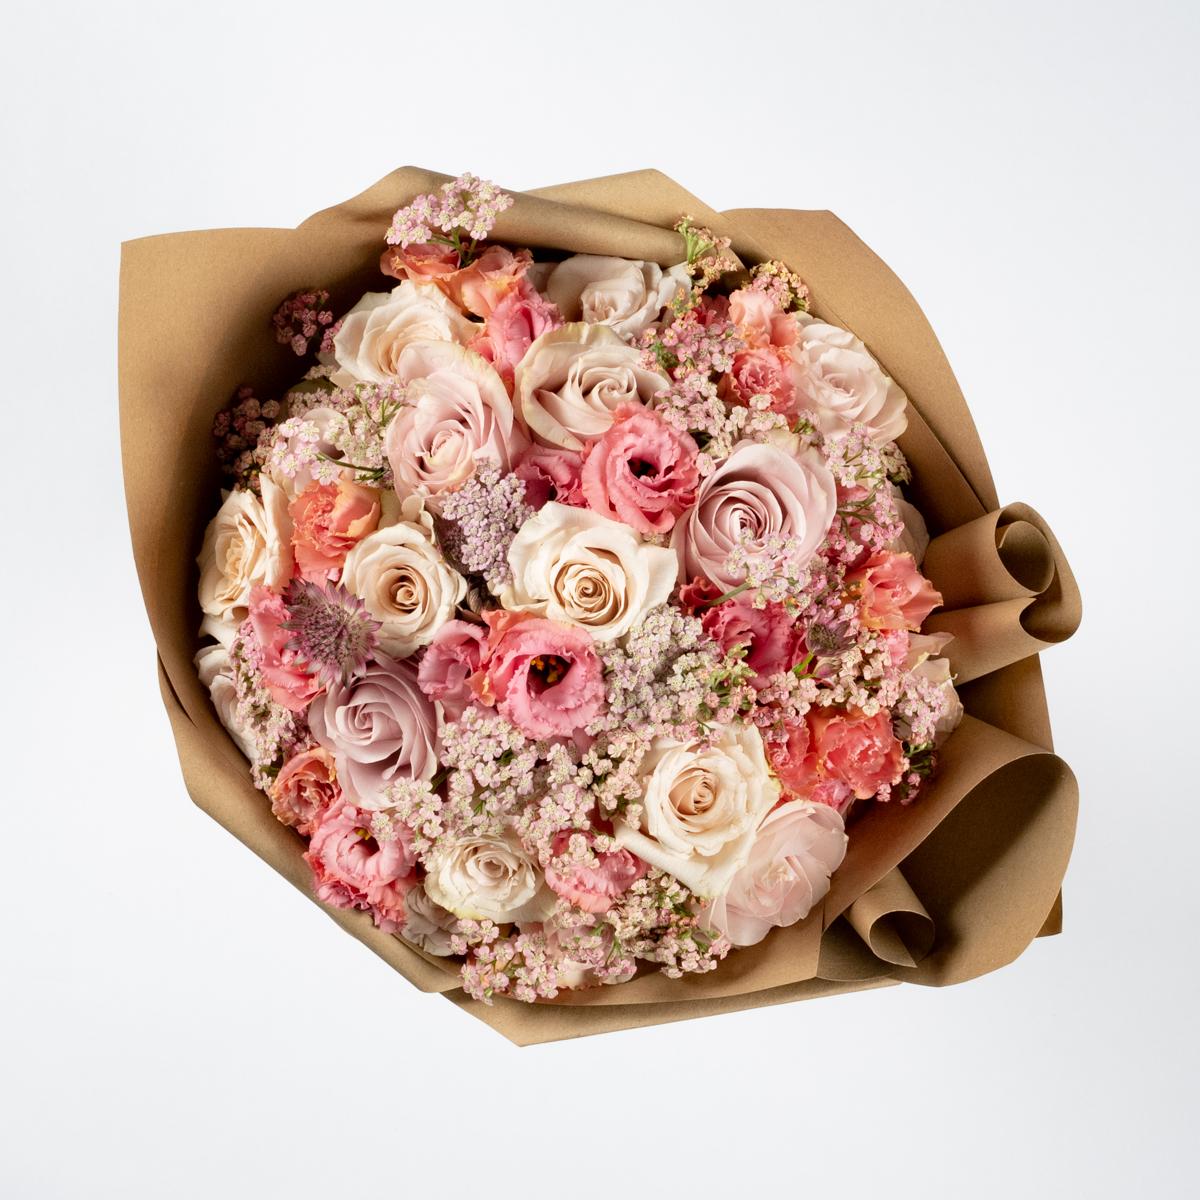 Bloom Flower Delivery | Halewood Bouquet